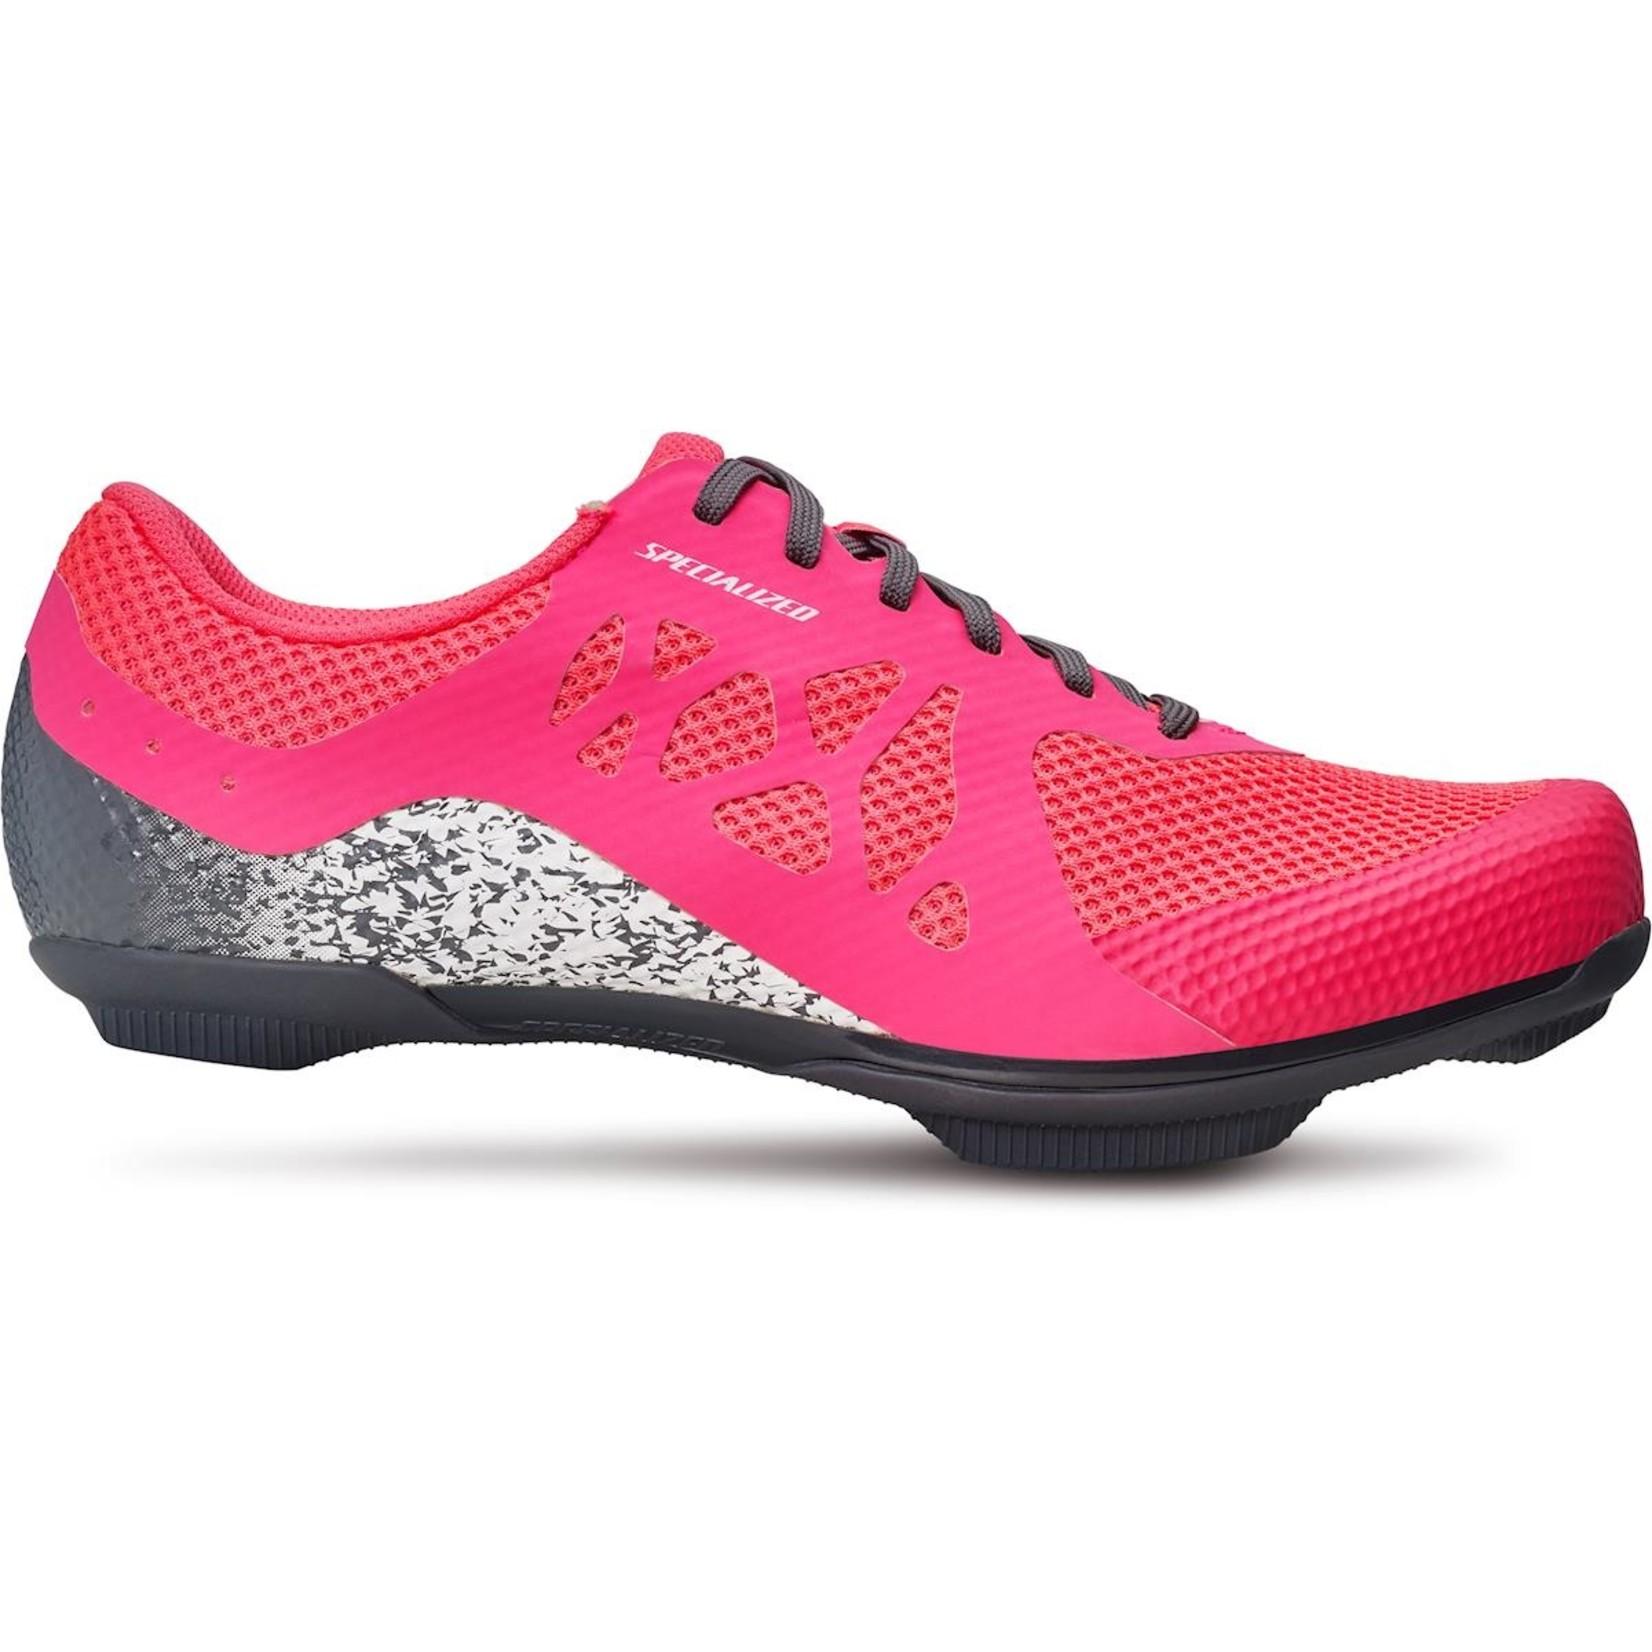 Specialized Remix Shoe